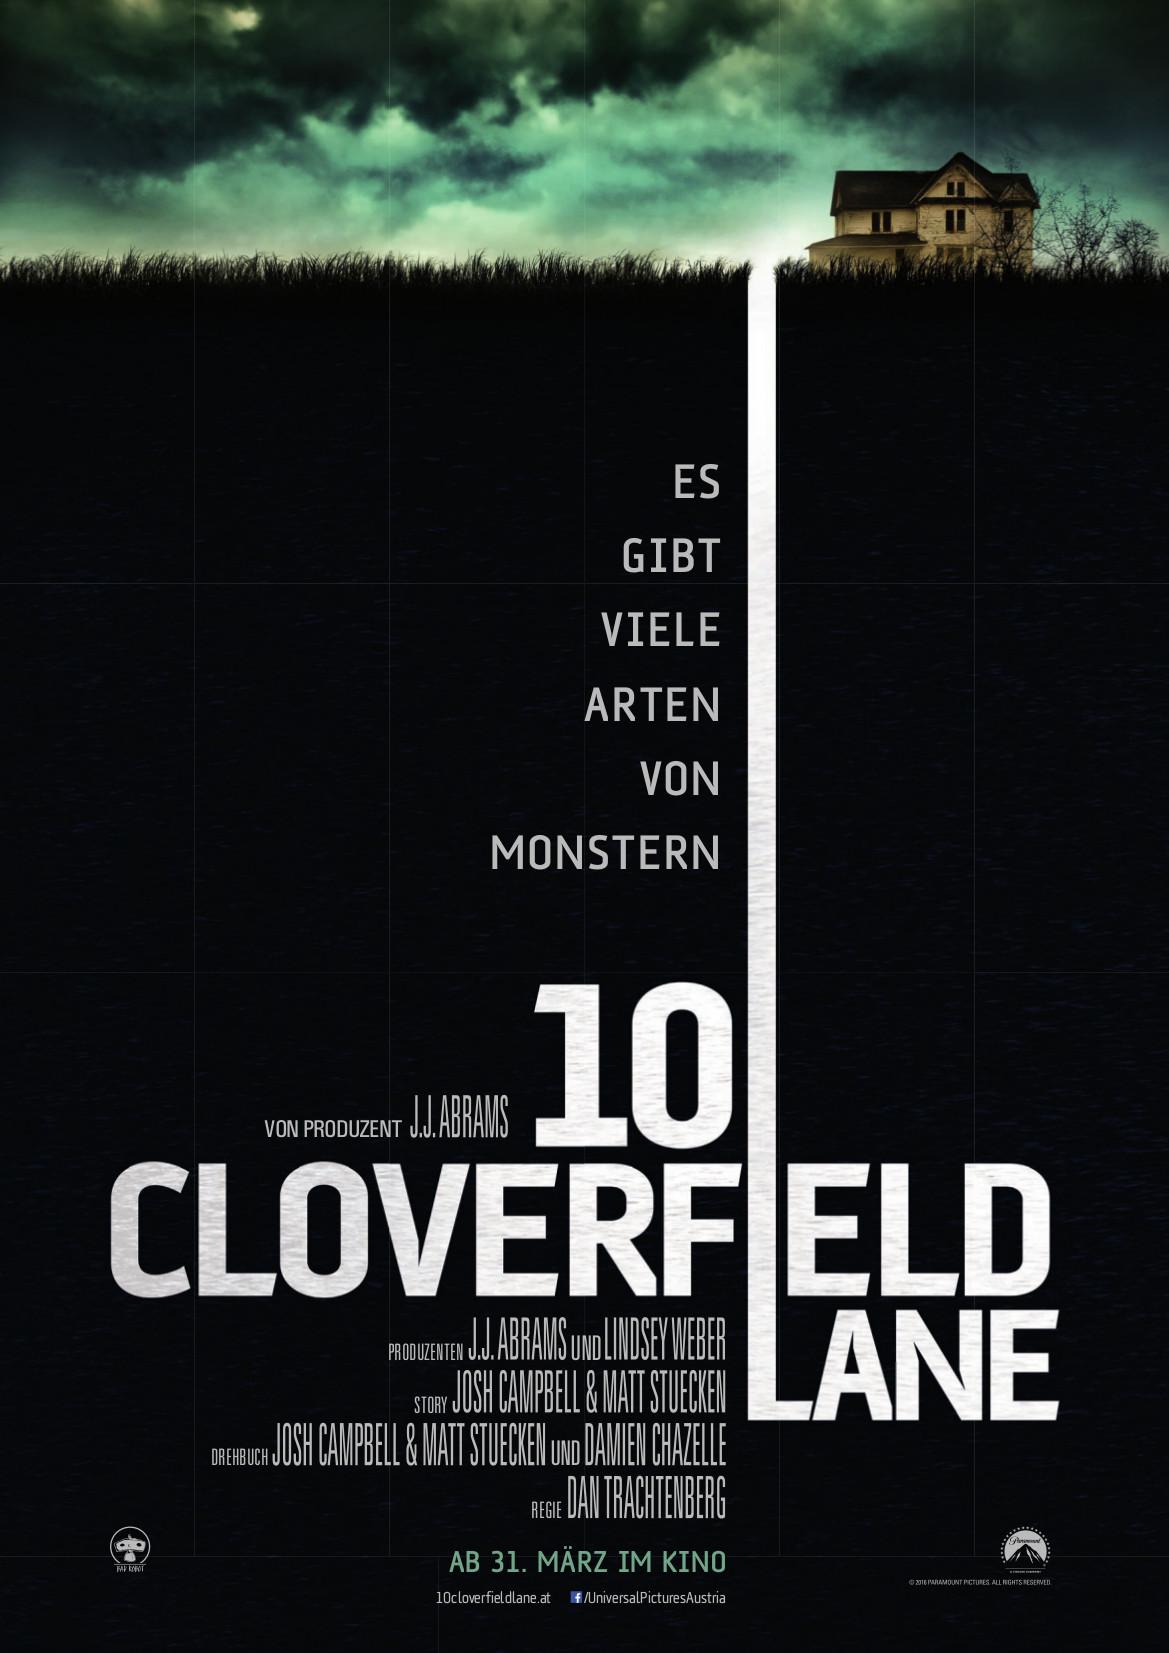 10CloverfieldLane-OneSheet-kl